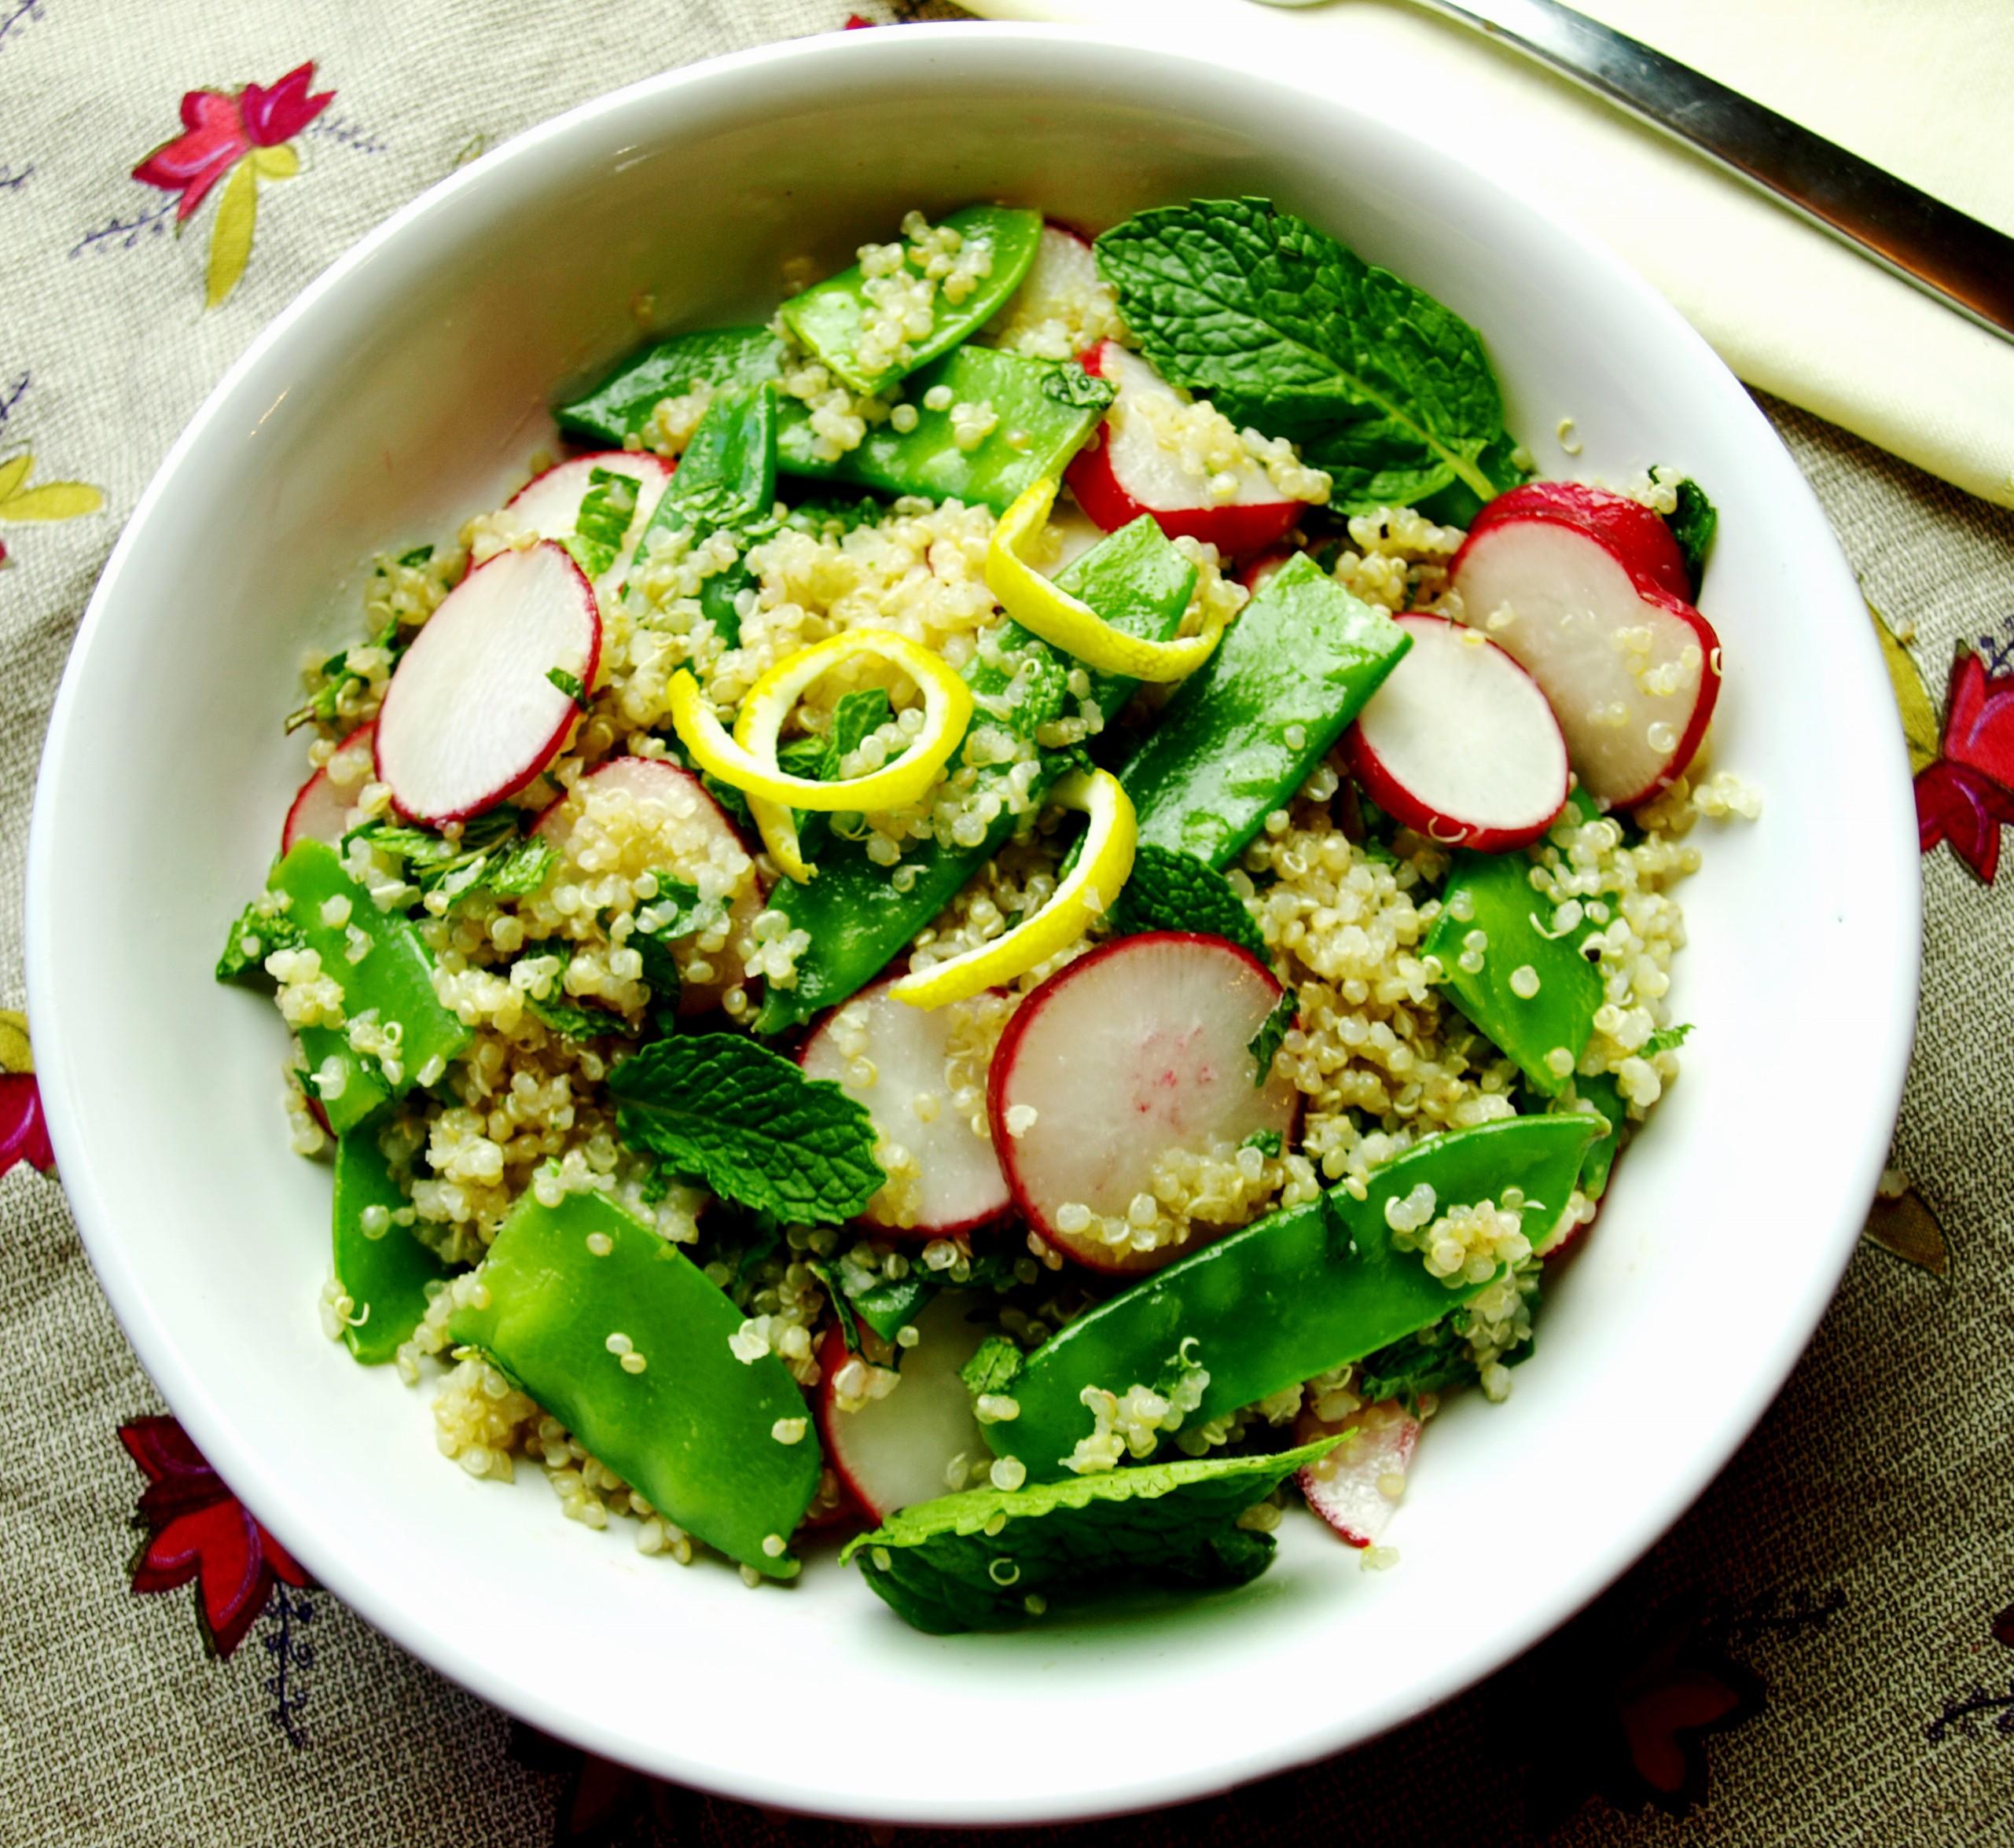 Forum on this topic: Fresh Pea and Radish Salad, fresh-pea-and-radish-salad/